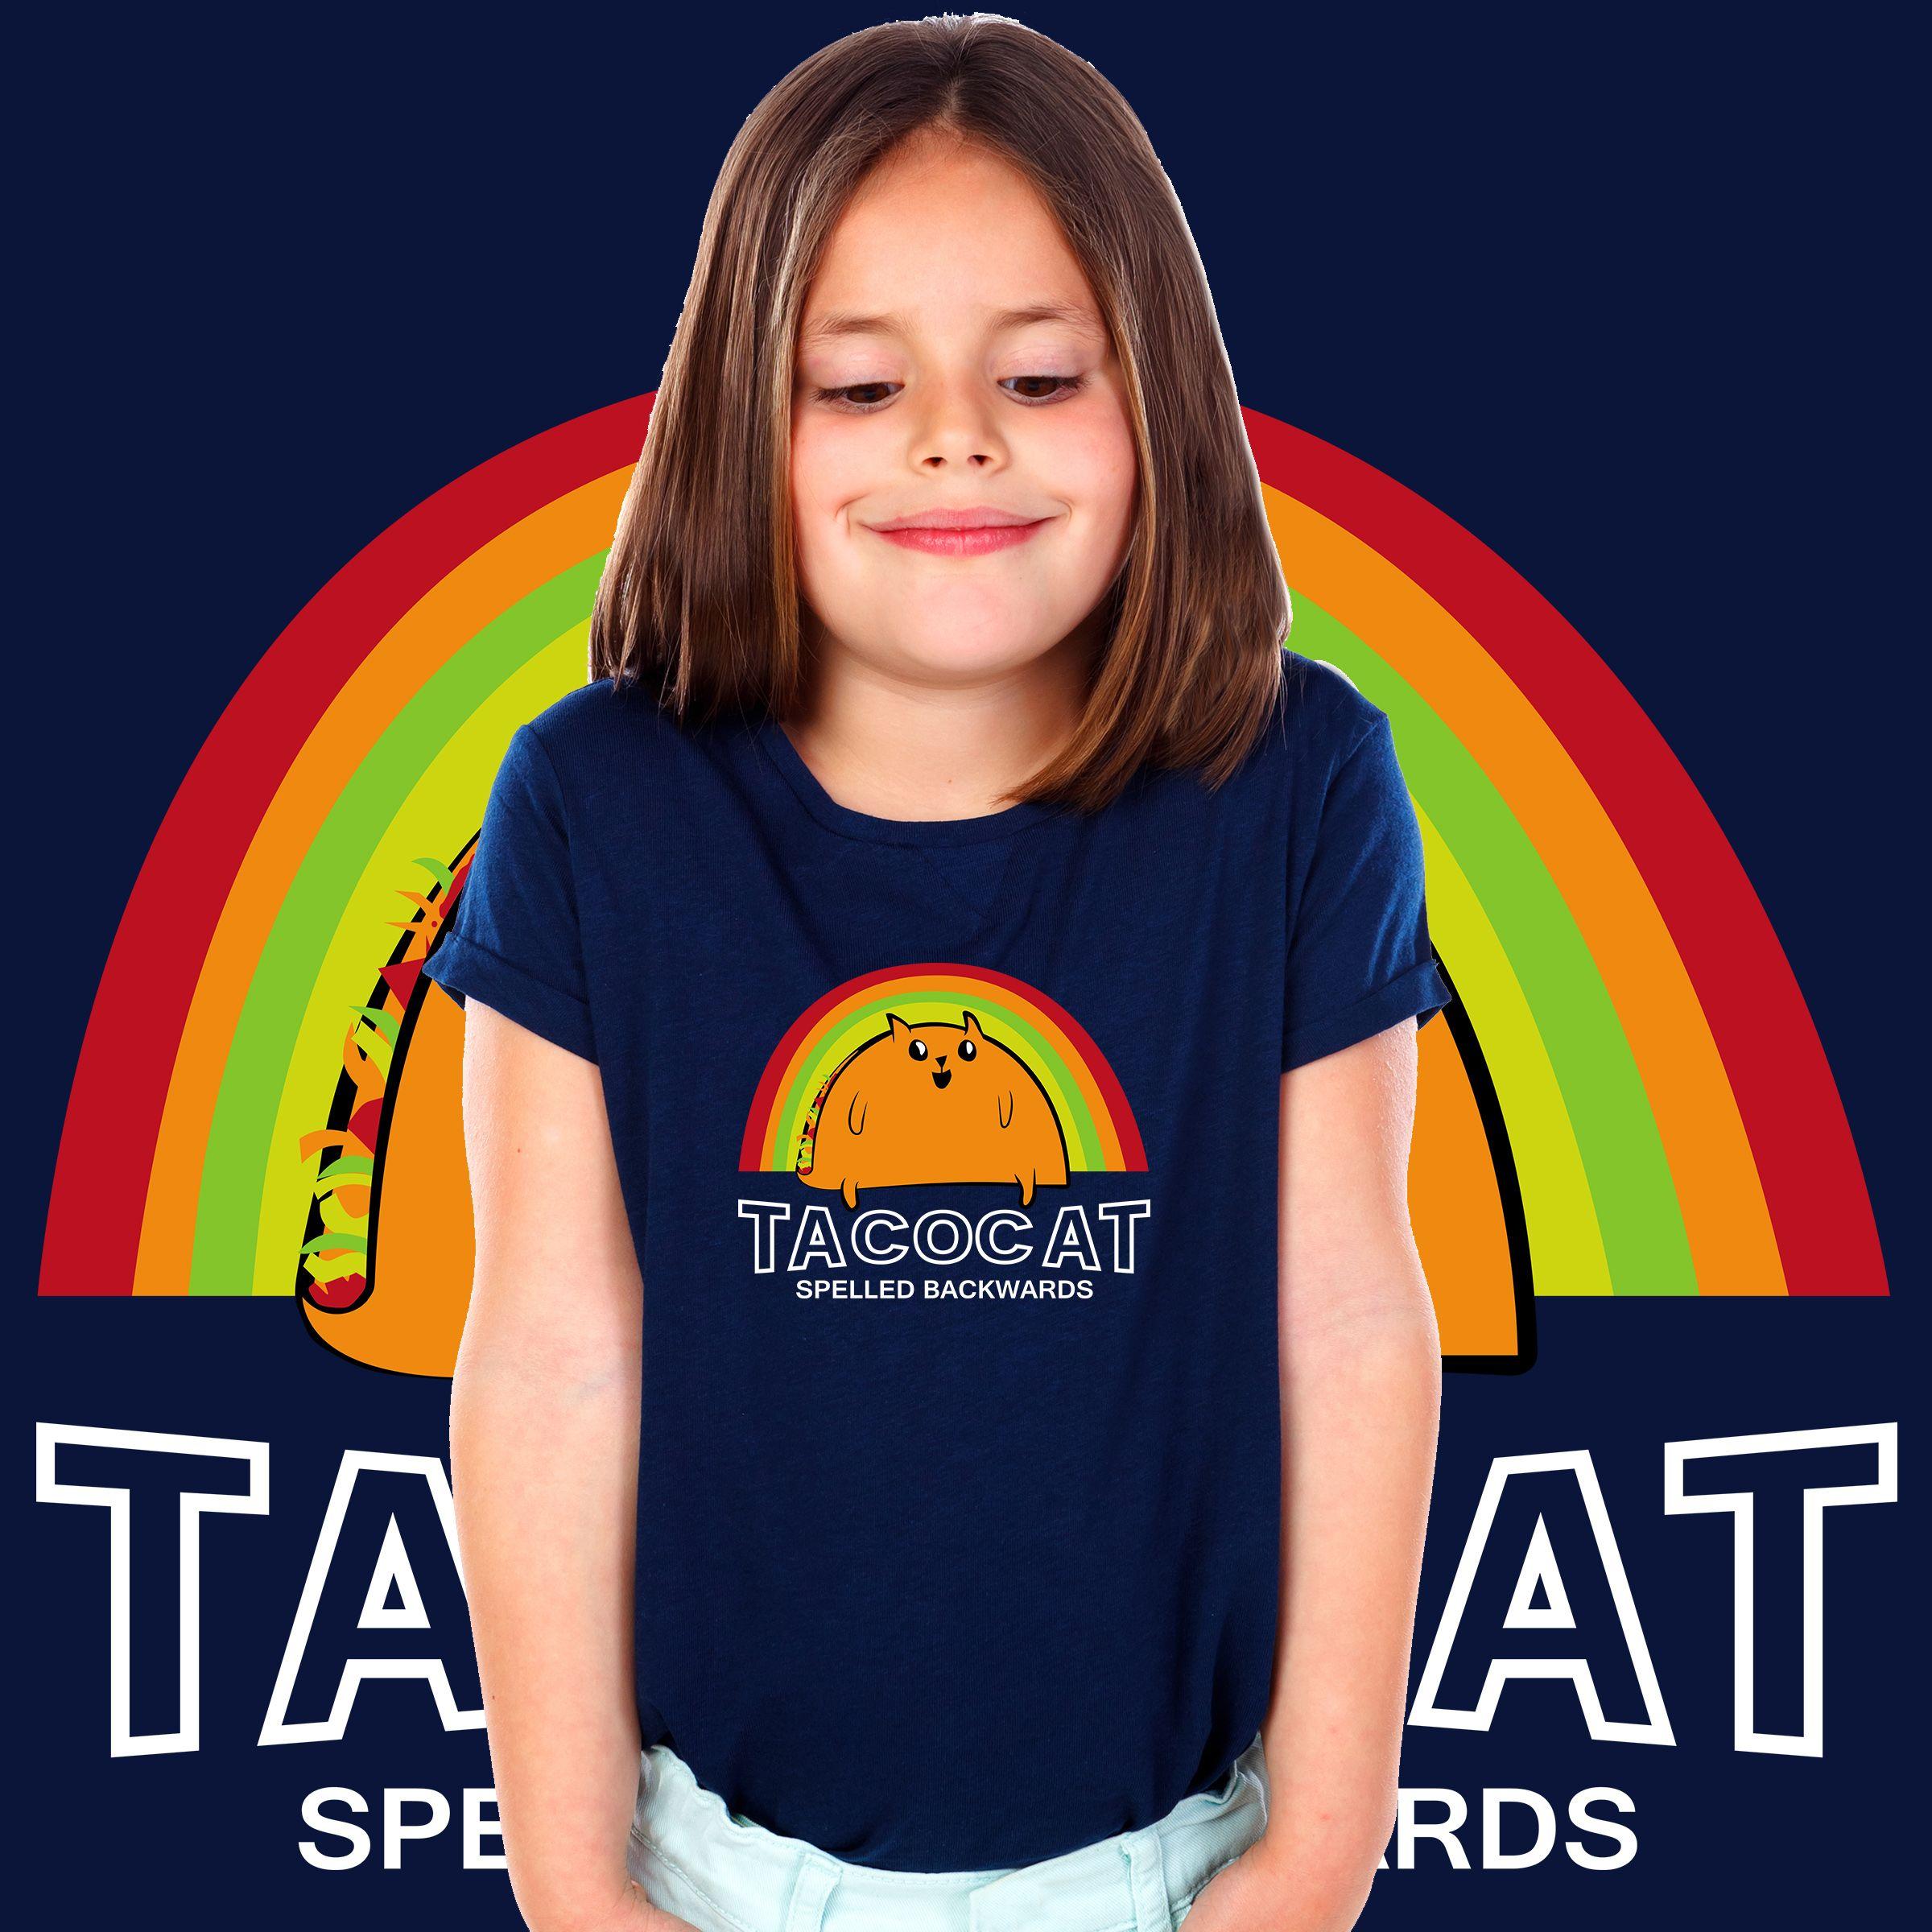 9738ab6c Taco Cat Spelled Backwards Youth T-shirt Designer by #Adel 🌮🐱 - #Taco  #TacoCat #cat #SpelledBackwards #Spelled #Ilovecat #paw #Mexico #Mexican  #cartoon ...